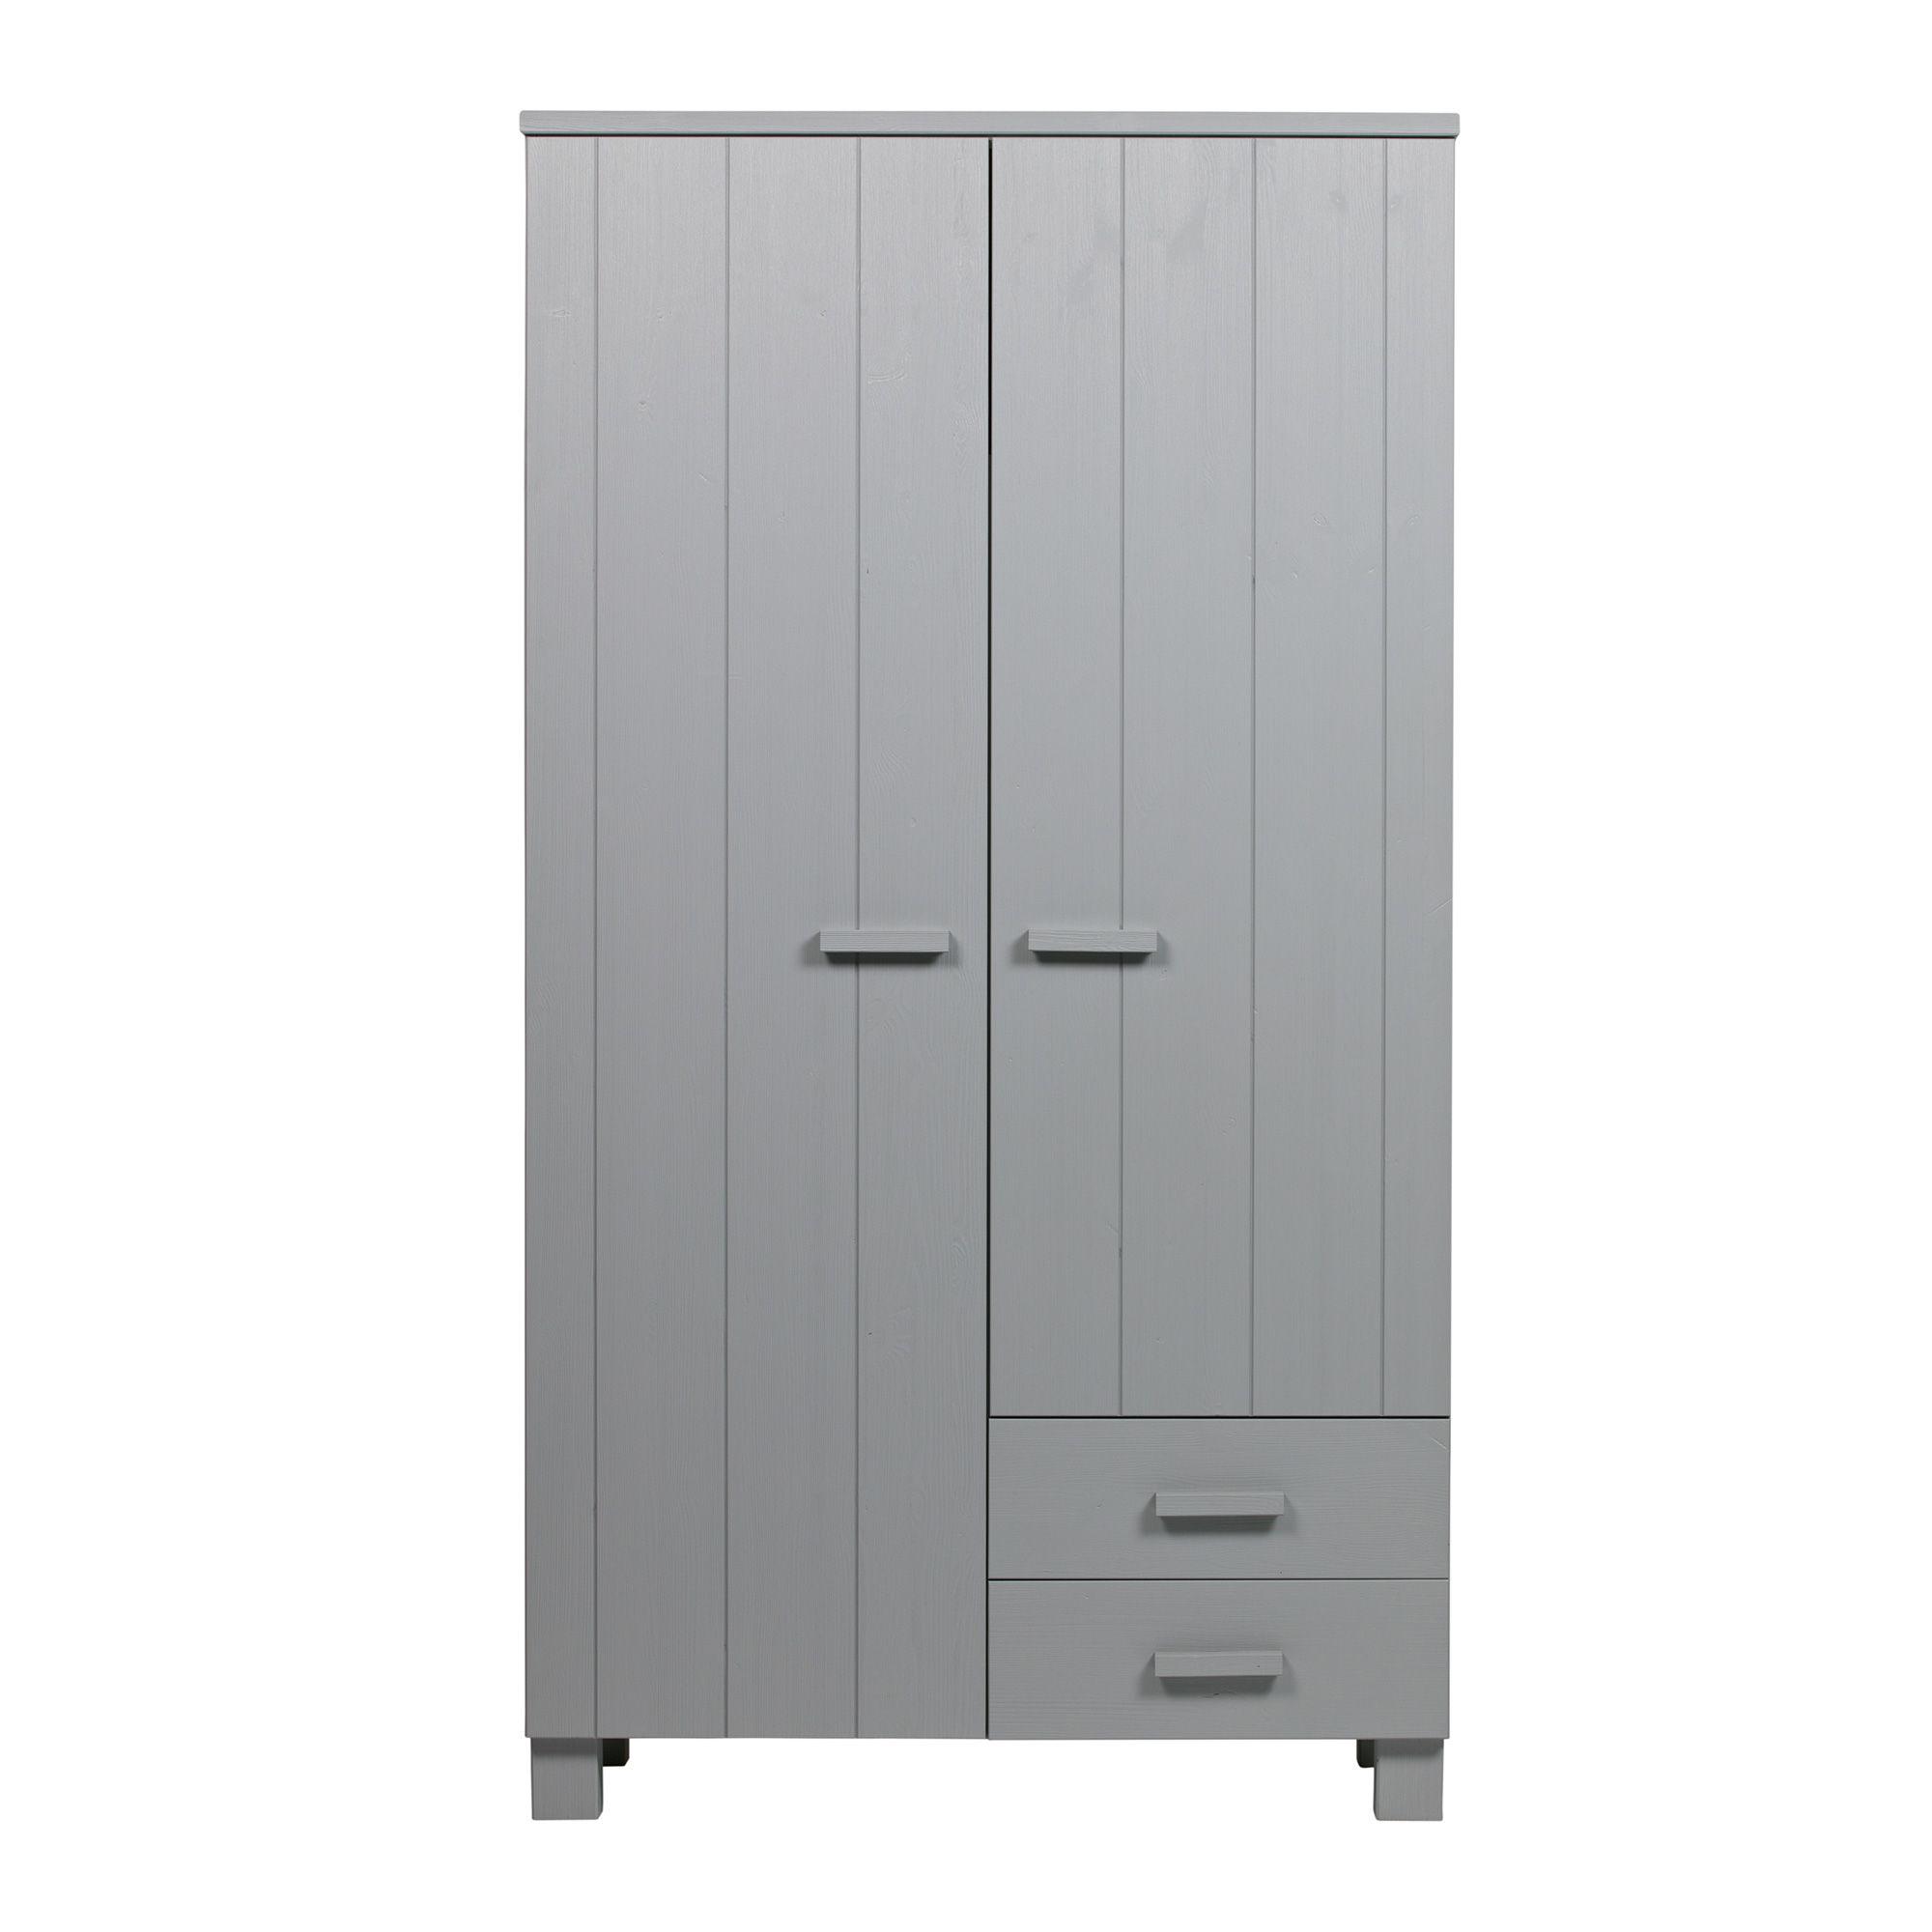 Woood Dennis Bed.Woood Dennis 2 Door Wardrobe 2 Drawers Concrete Grey